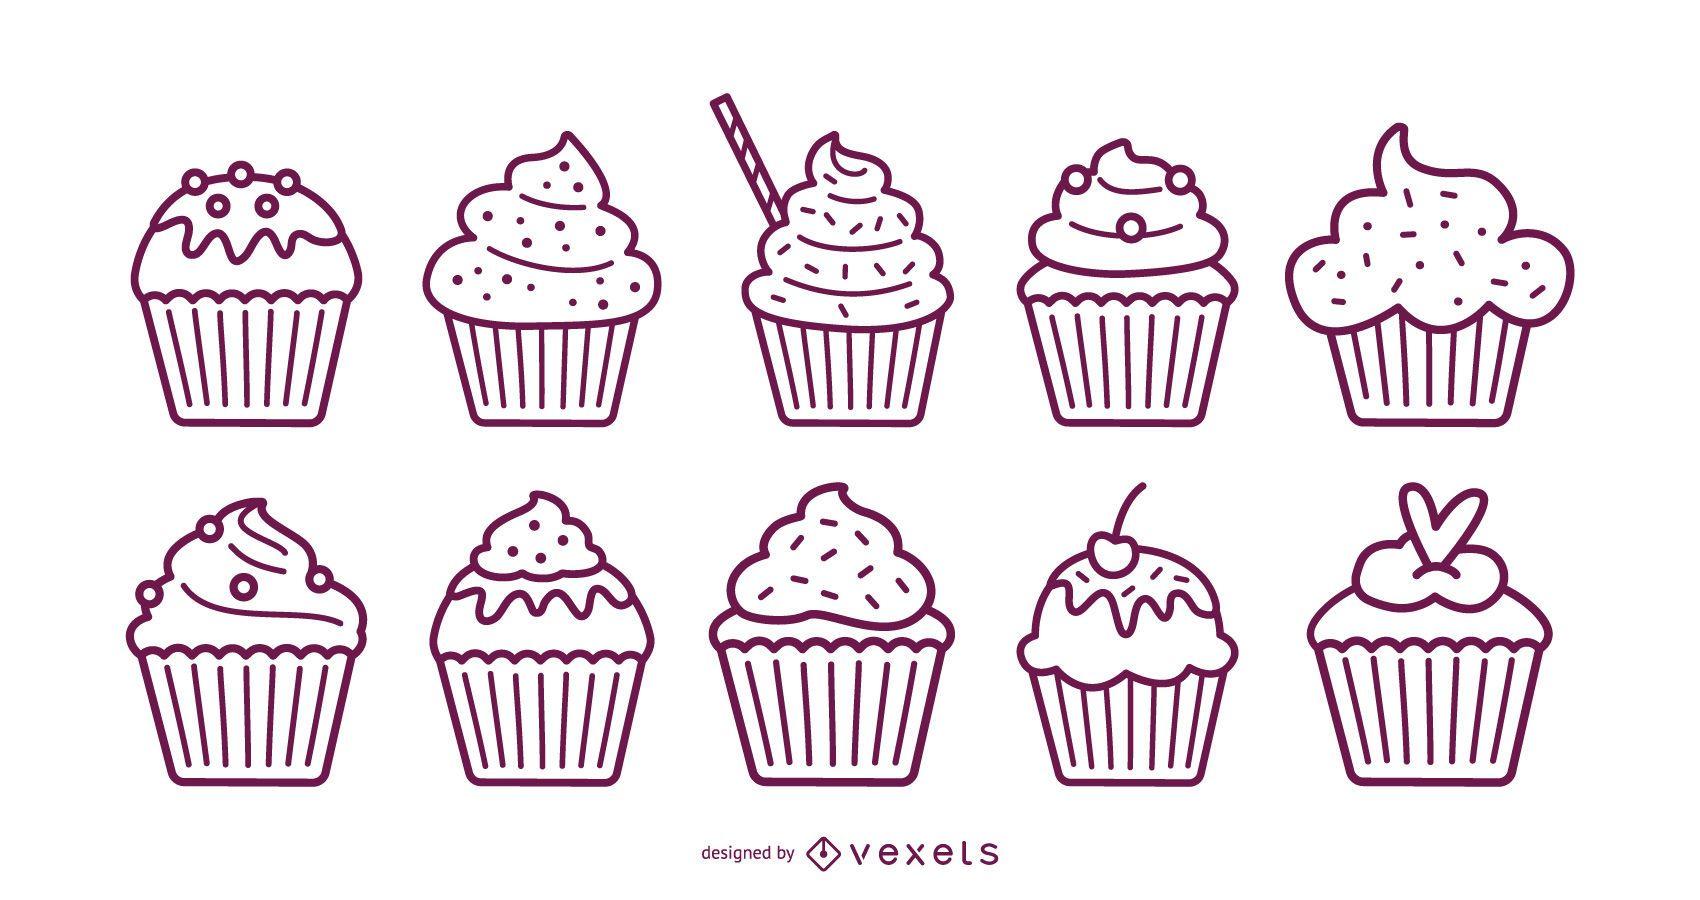 Cupcakes Strichset